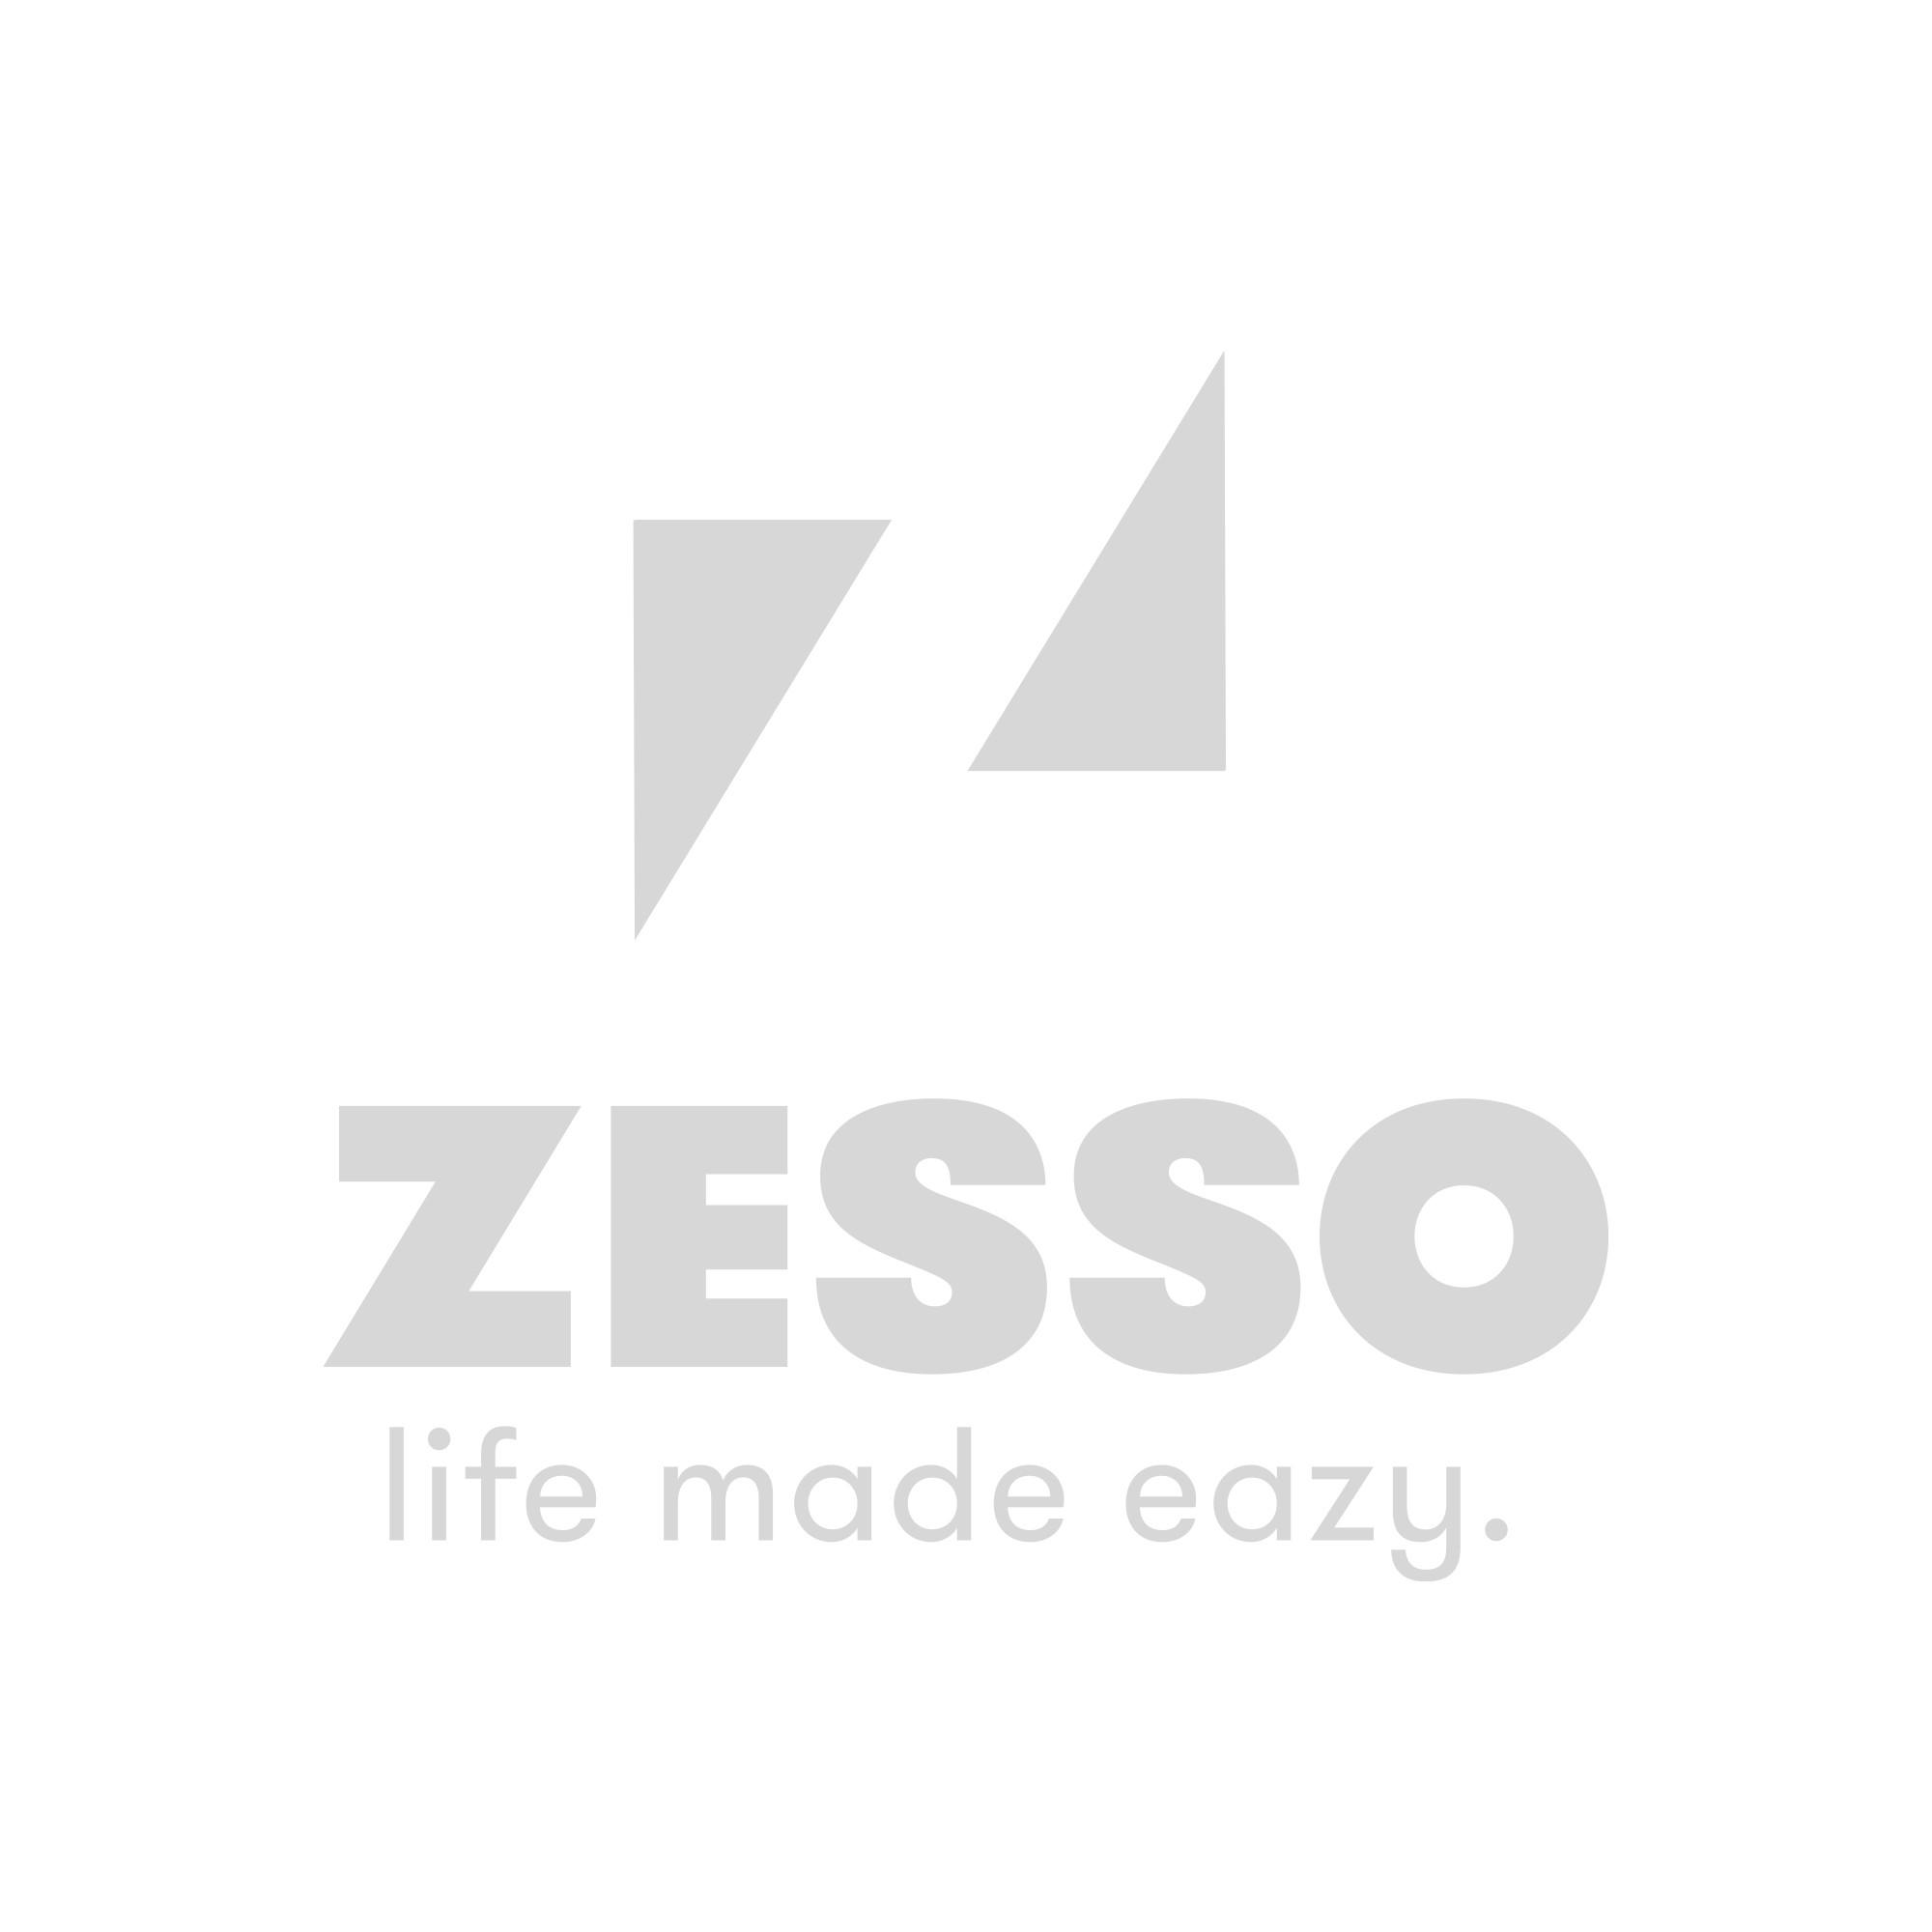 Houten Inklapbare Kinderstoel.Houten Kinderstoel Kopen Enyabe Baninni Kinderstoel Dolce Mio